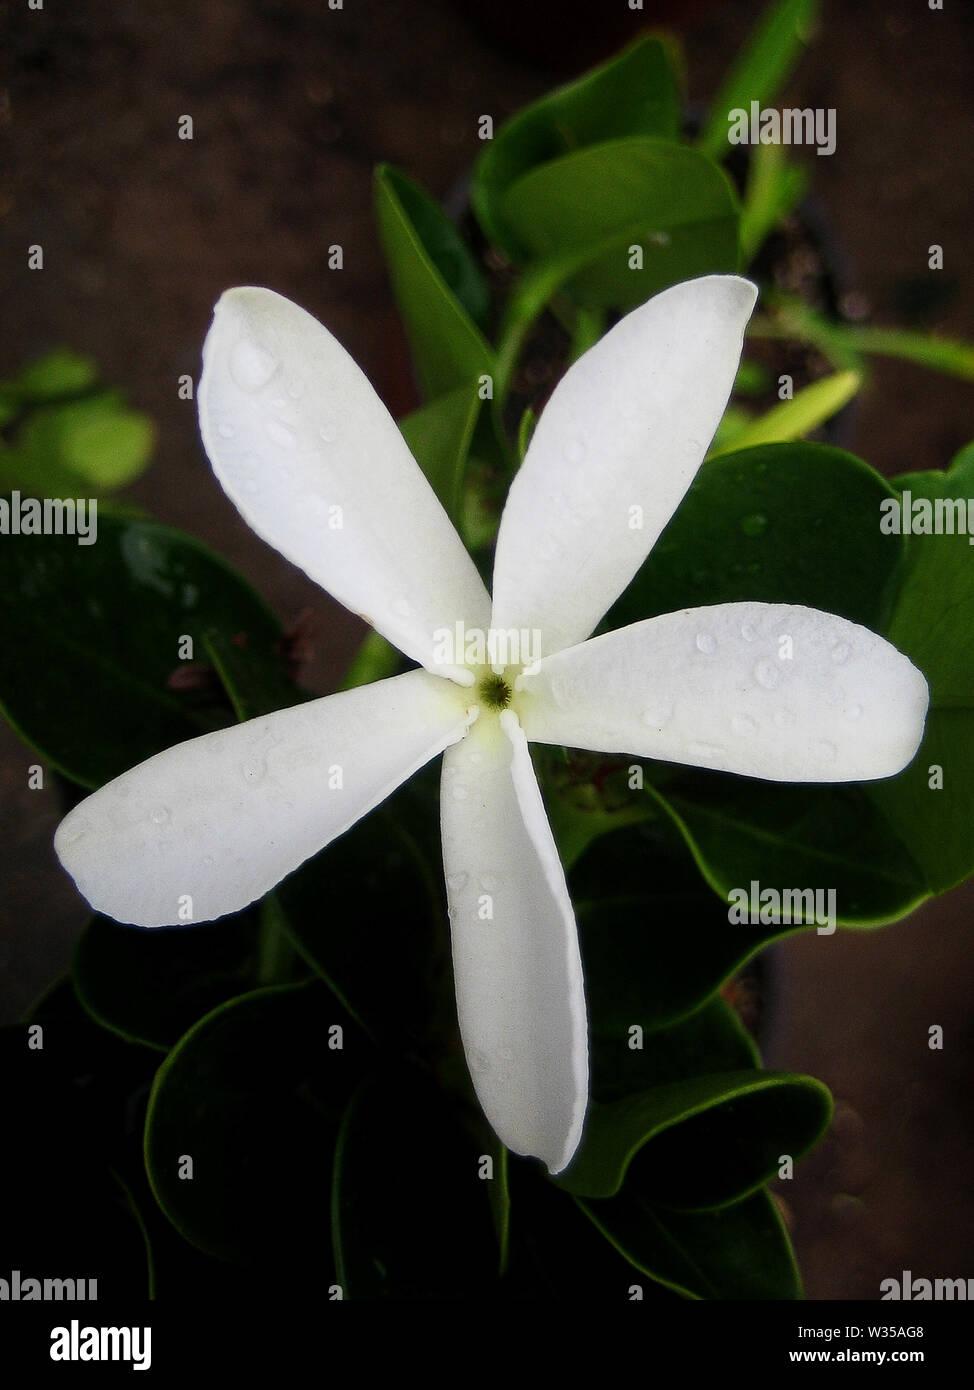 Carissa macro flower apocynaceae family background wallpaper fine art prints. - Stock Image